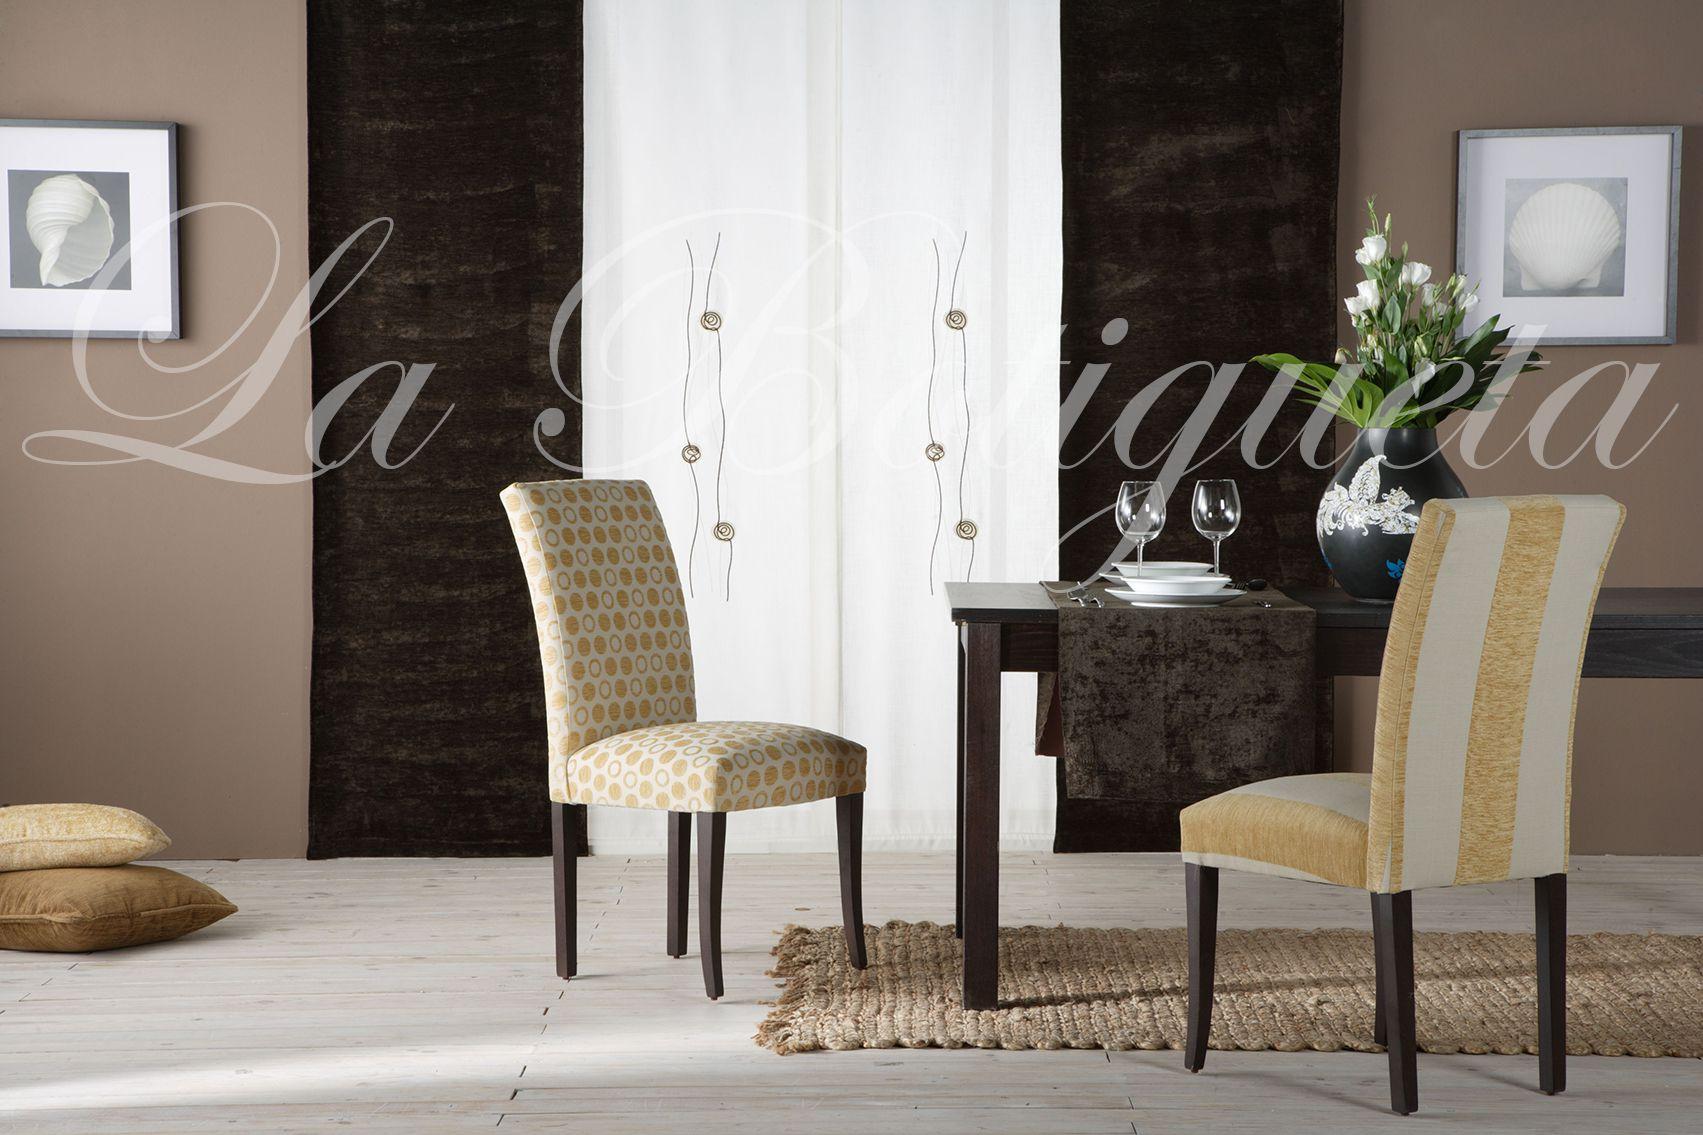 Cortinas y estores para comedor o sal n modernos o cl sicos for Modelos de cortinas de salon